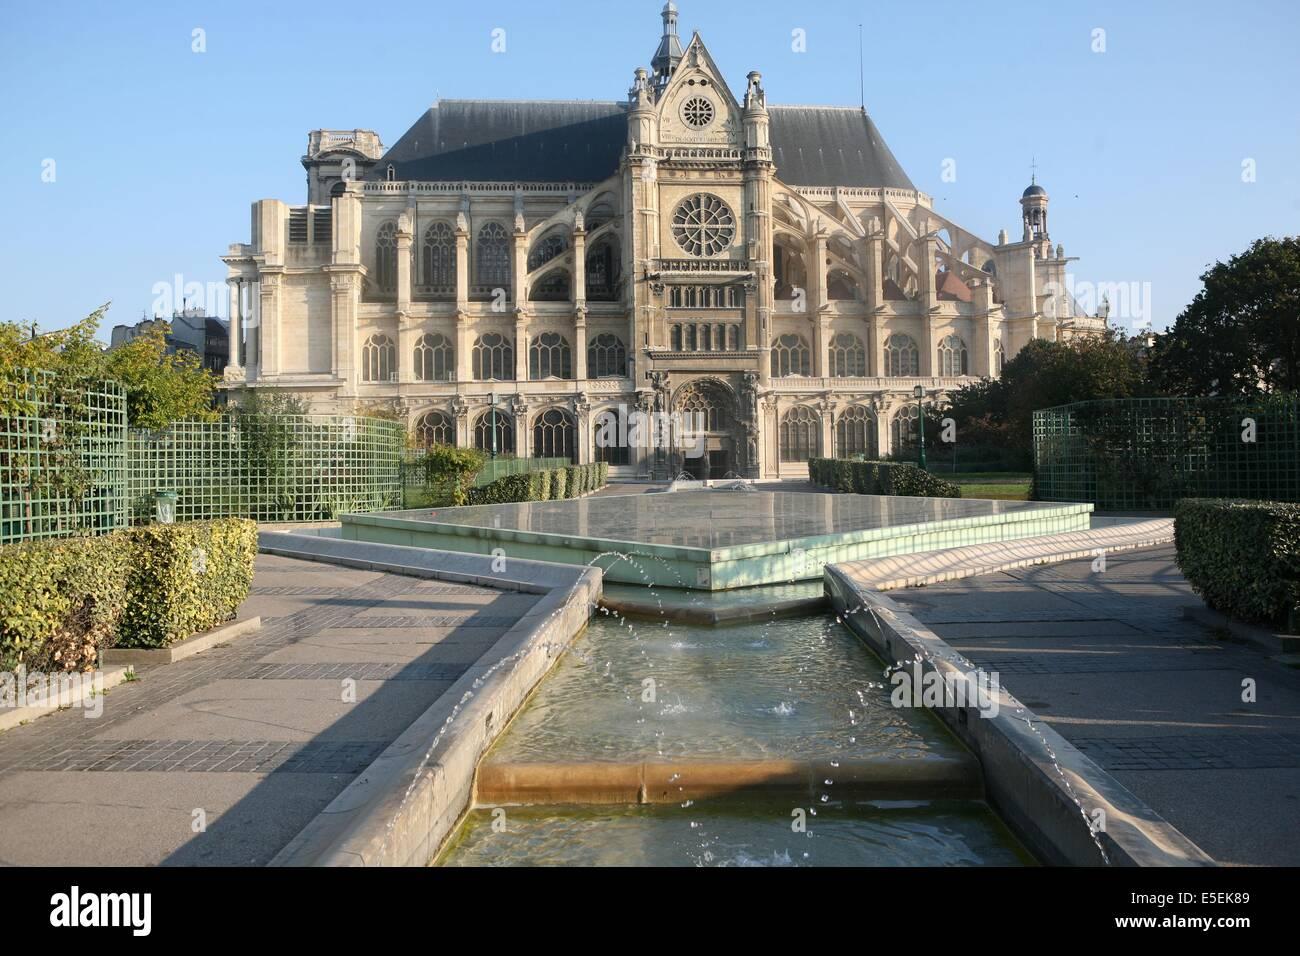 Bassin Fontaine De Jardin church saint eustache stock photos & church saint eustache